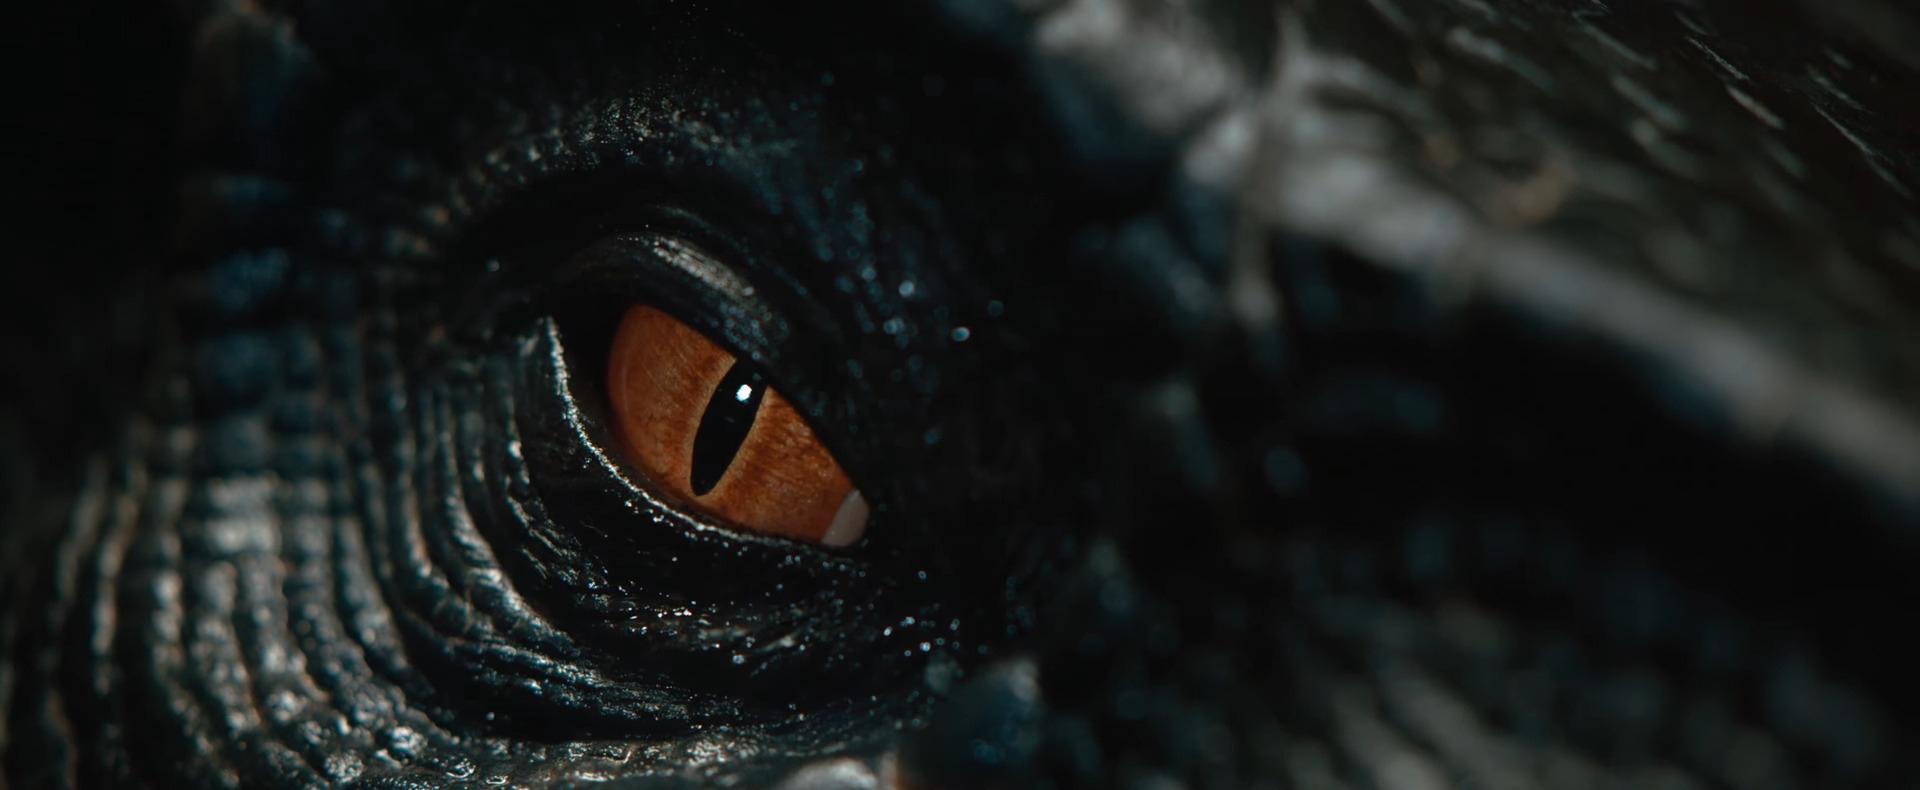 Jurassic World Fallen Kingdon Behind The Scenes